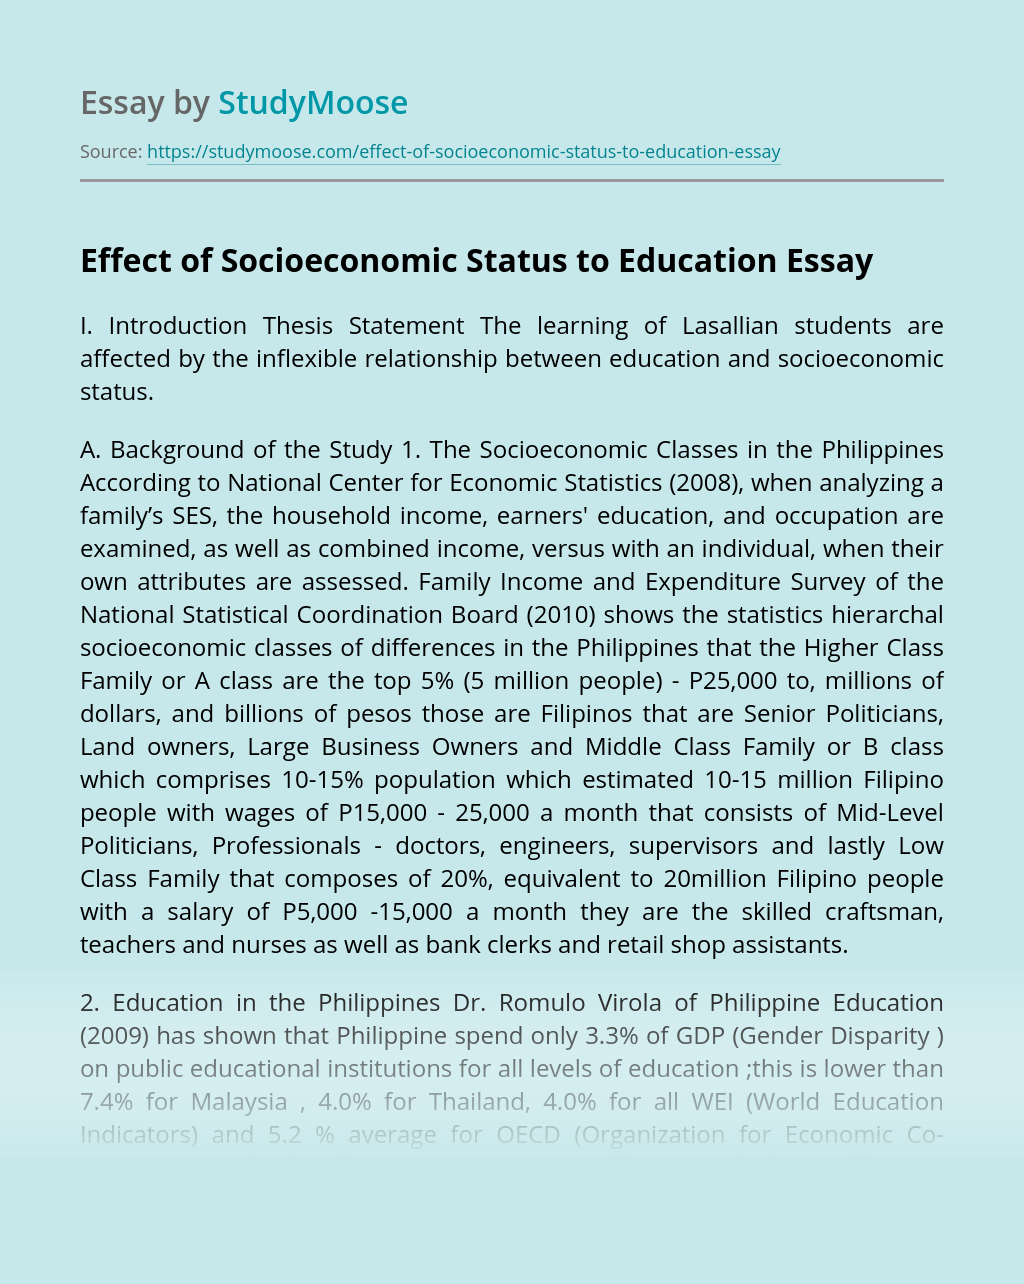 Effect of Socioeconomic Status to Education